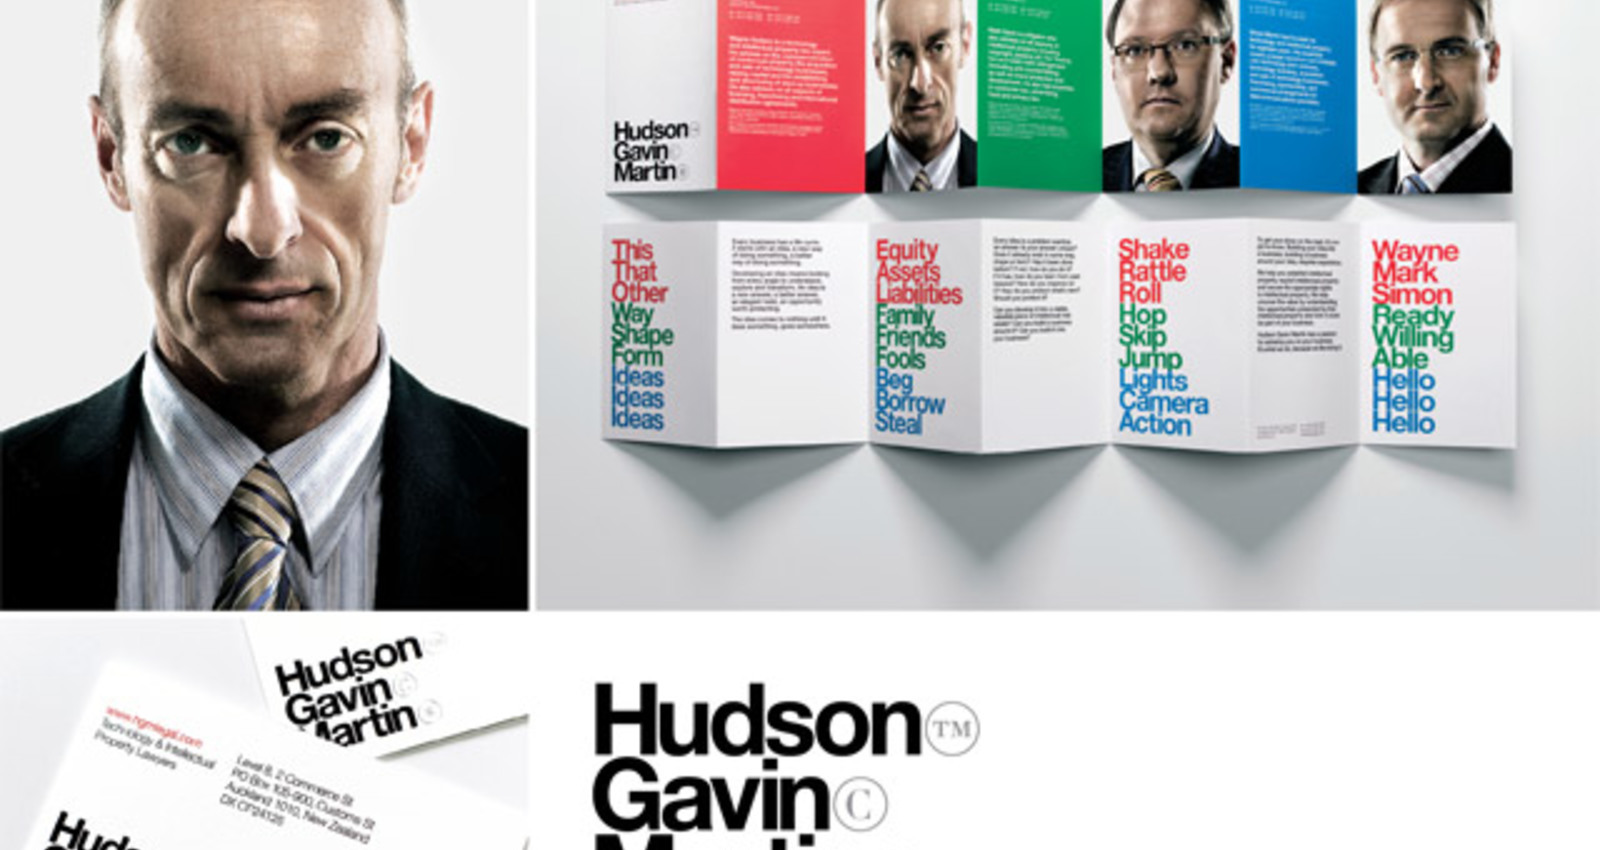 Hudson Gavin Martin Identity